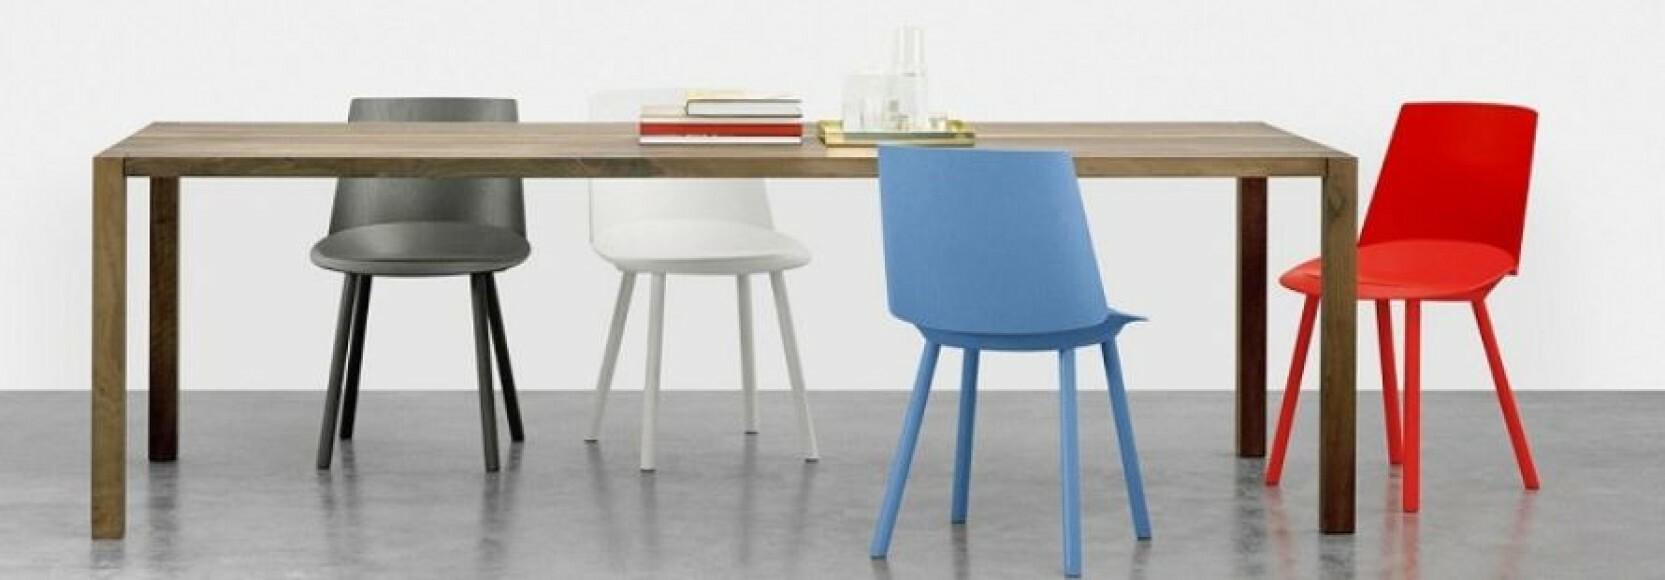 rheinische museen ausstellung full house design by. Black Bedroom Furniture Sets. Home Design Ideas